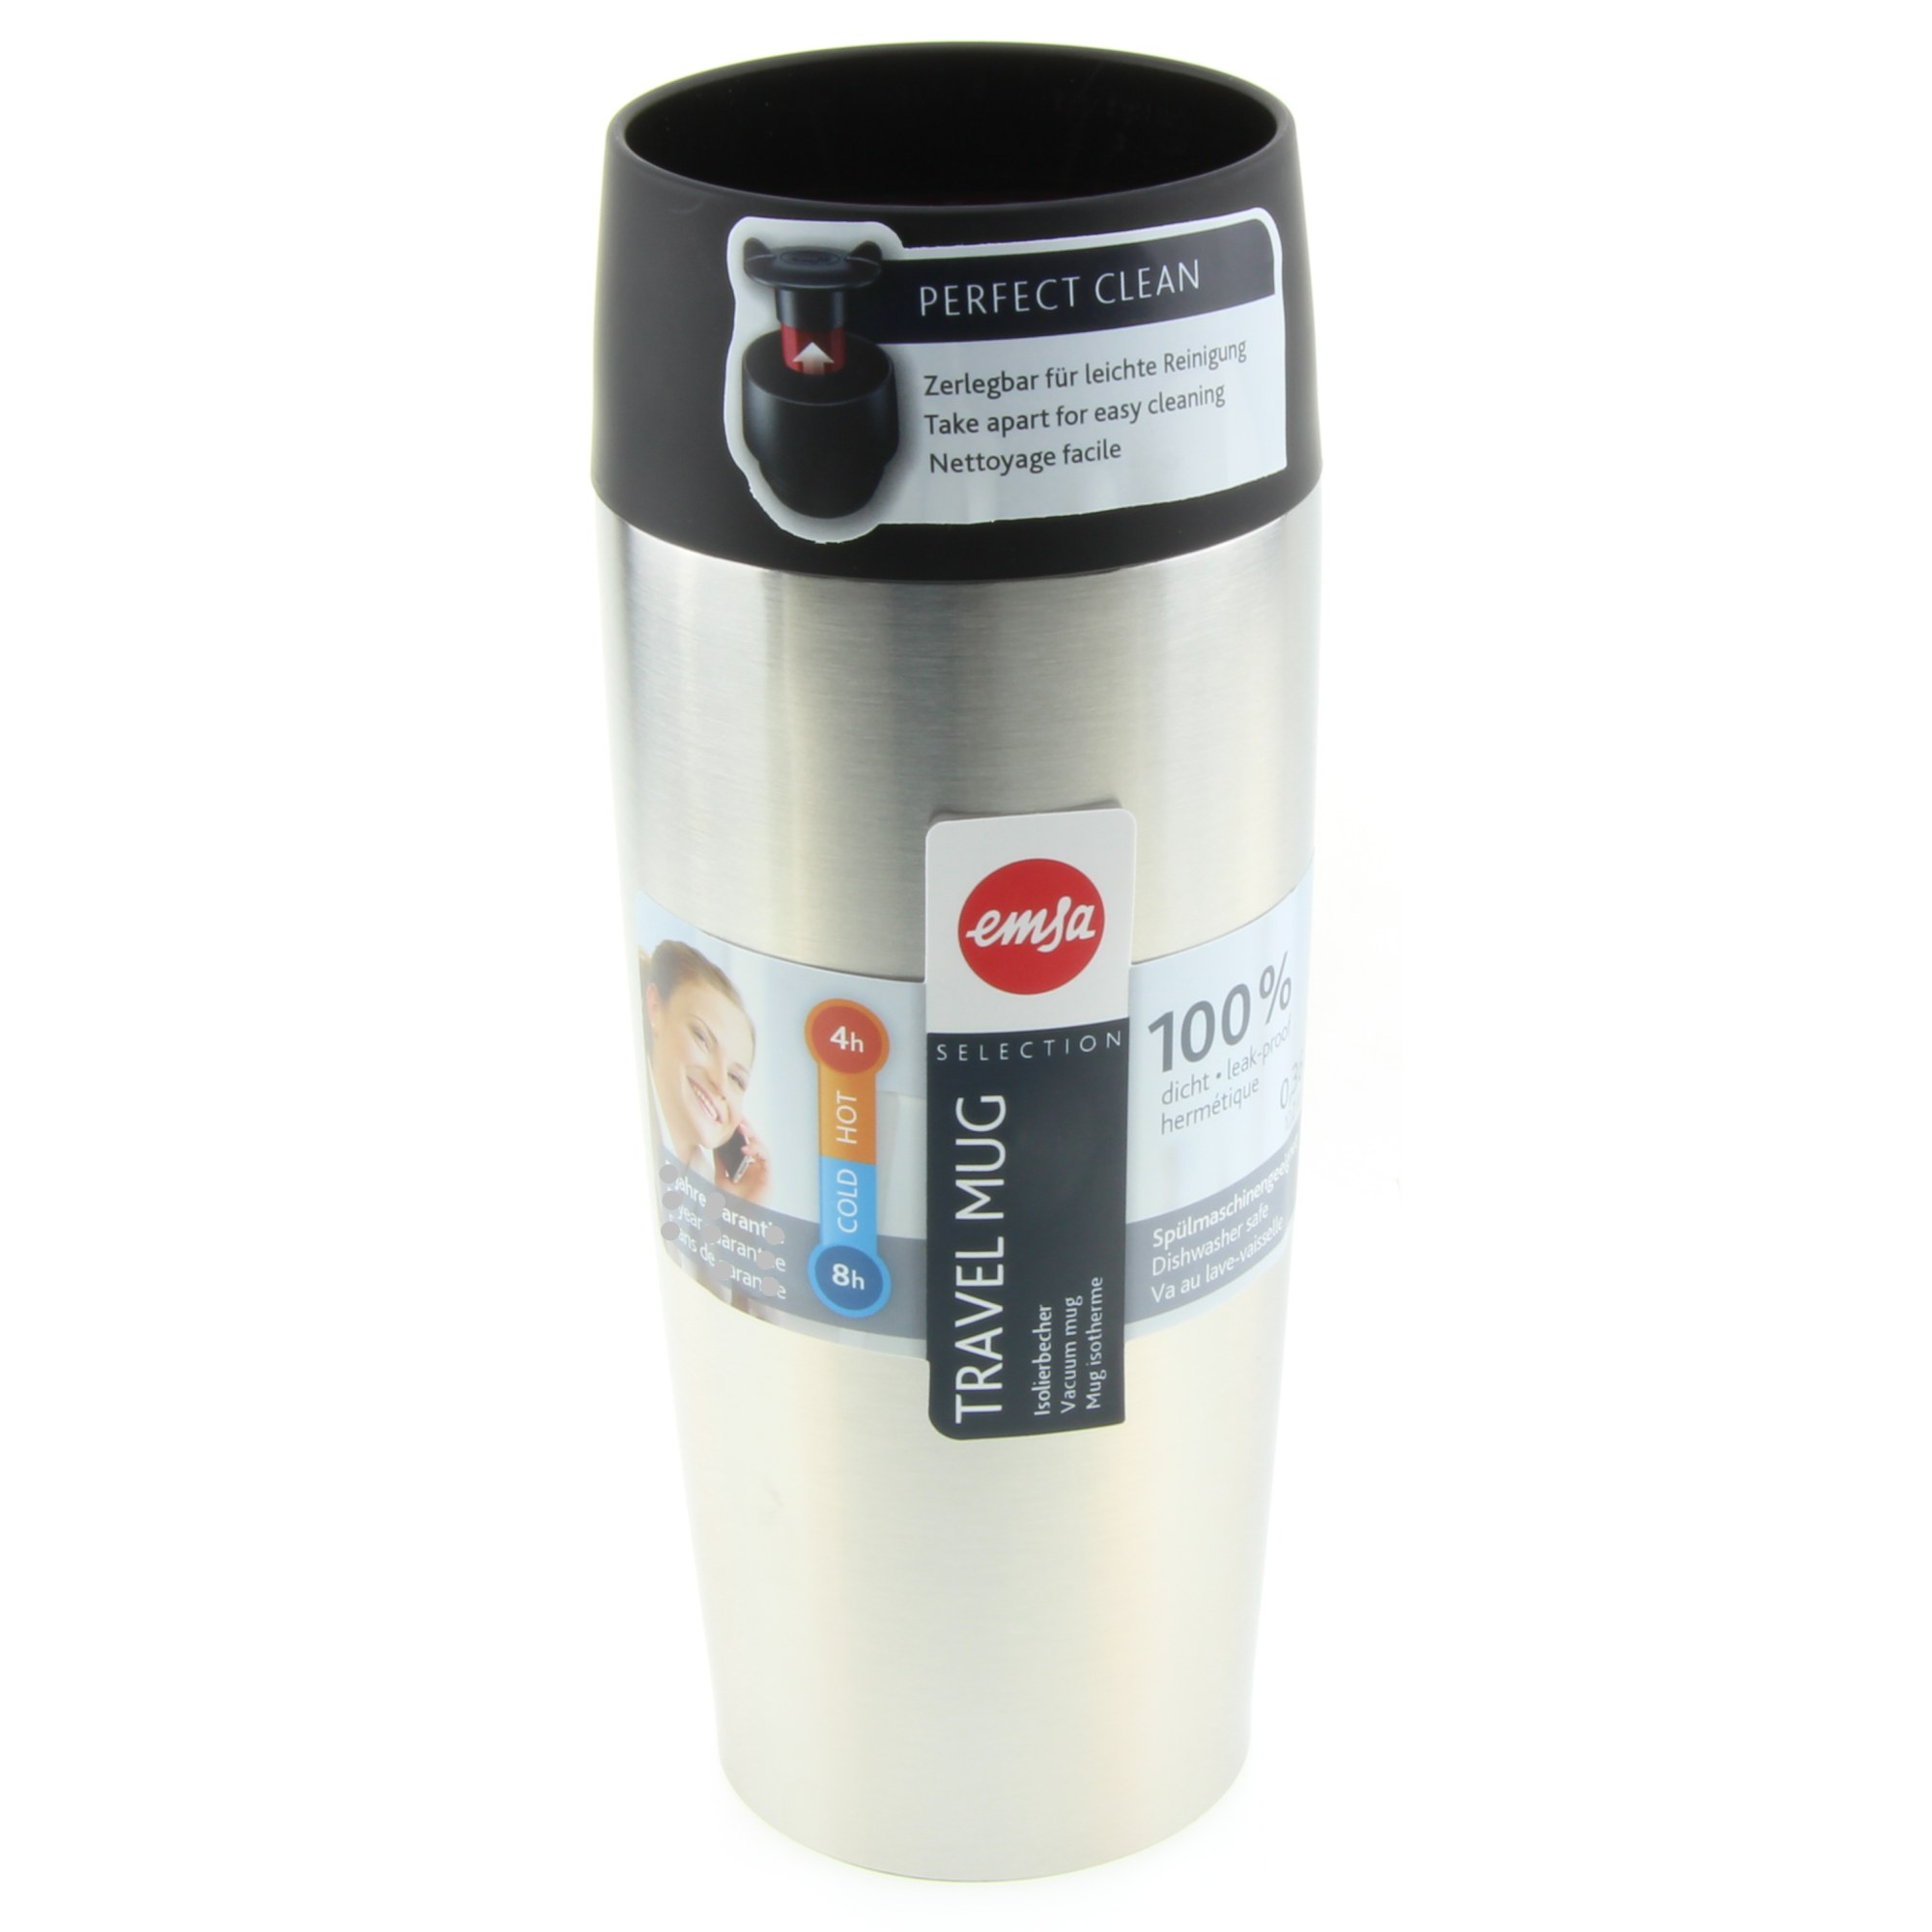 Emsa Travelmug Vacuum Mug Travel Mug Stainless Steel Vacuum Flasks Mugs Vacuum Jugs Flasks Eating Drinking 1a Neuware Englisch